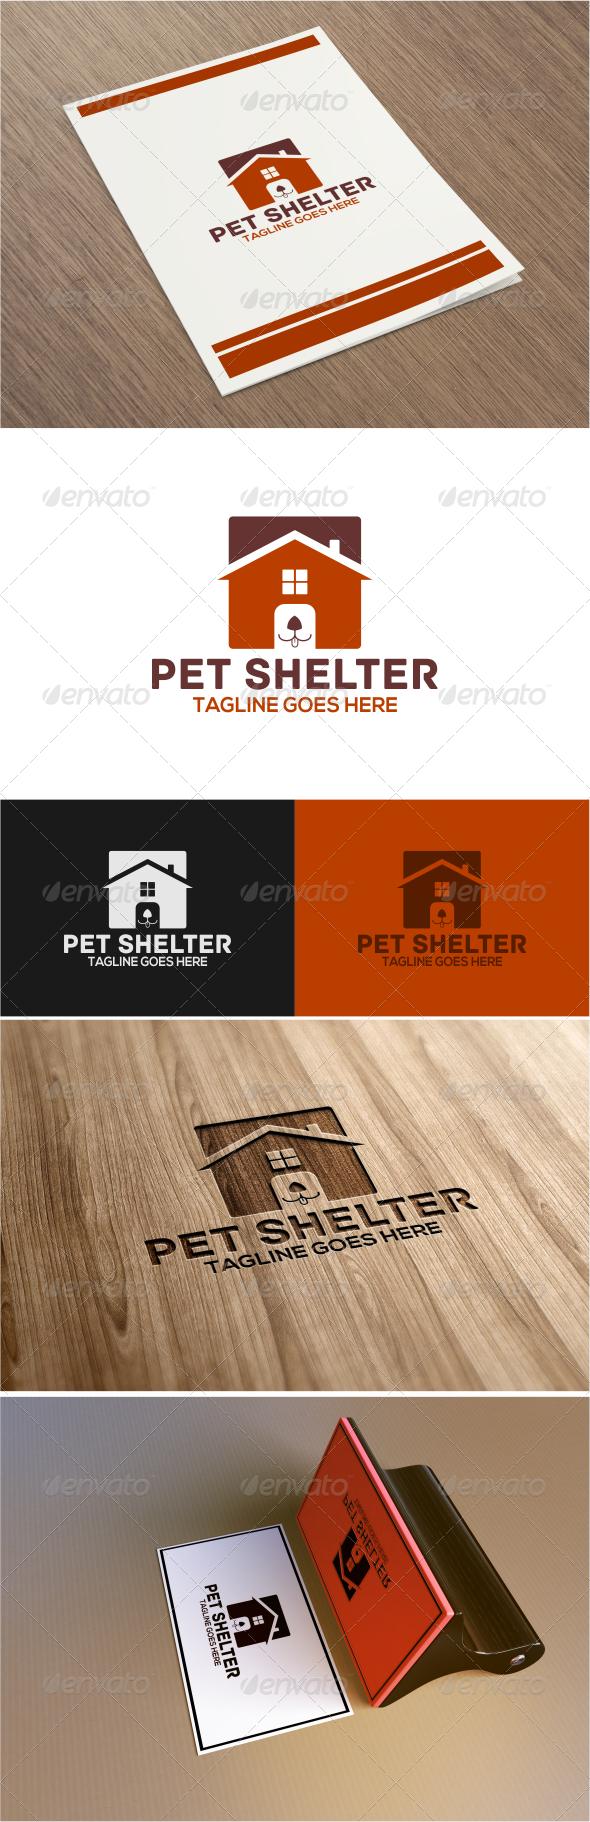 GraphicRiver Pet Shelter Logo Template 7817834